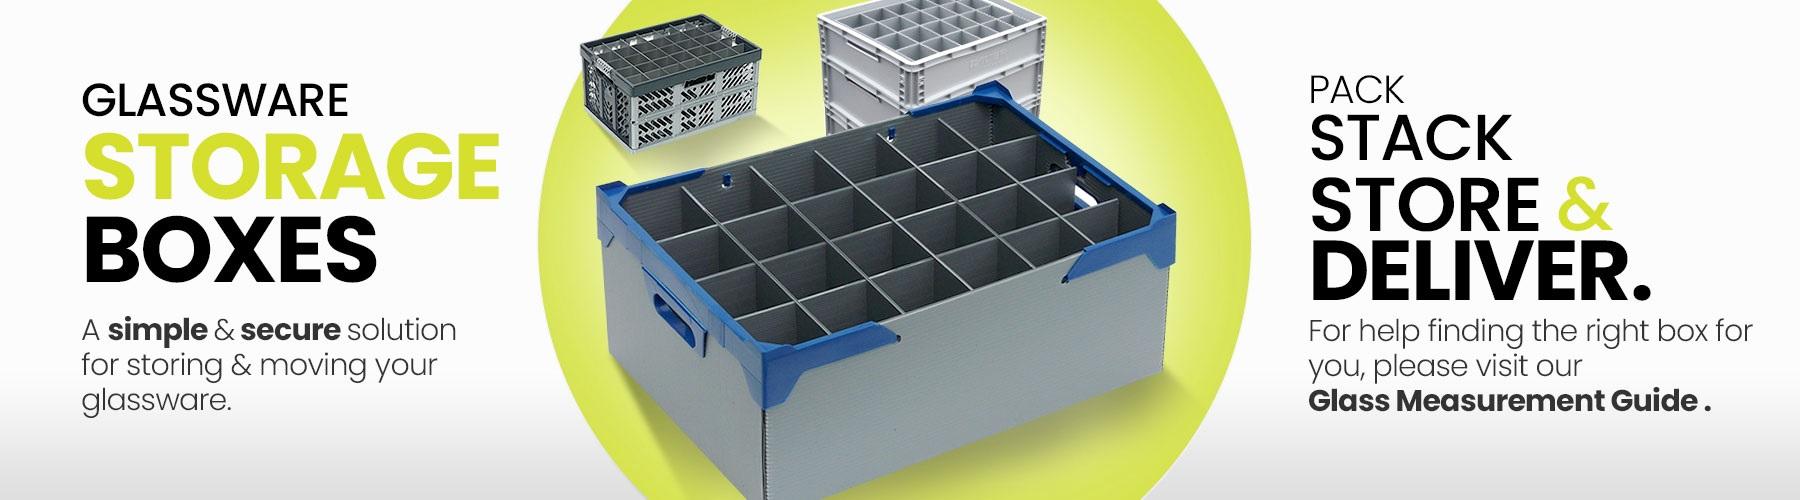 Glassjacks - Glassware Storage Boxes Crates Containers